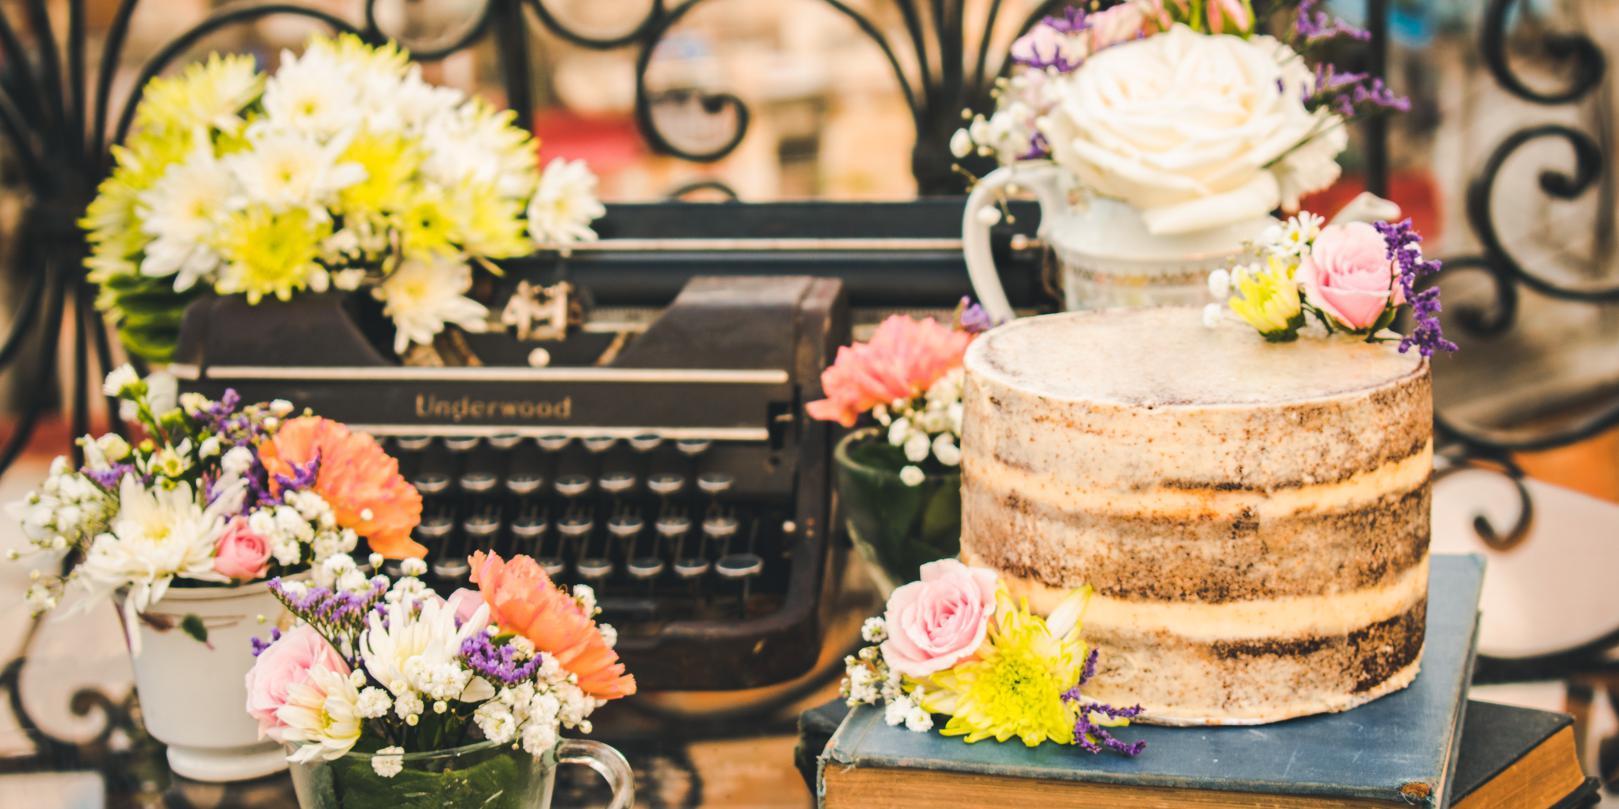 bodas-sin-clasificar-sin-tema-cuba-42531.jpg